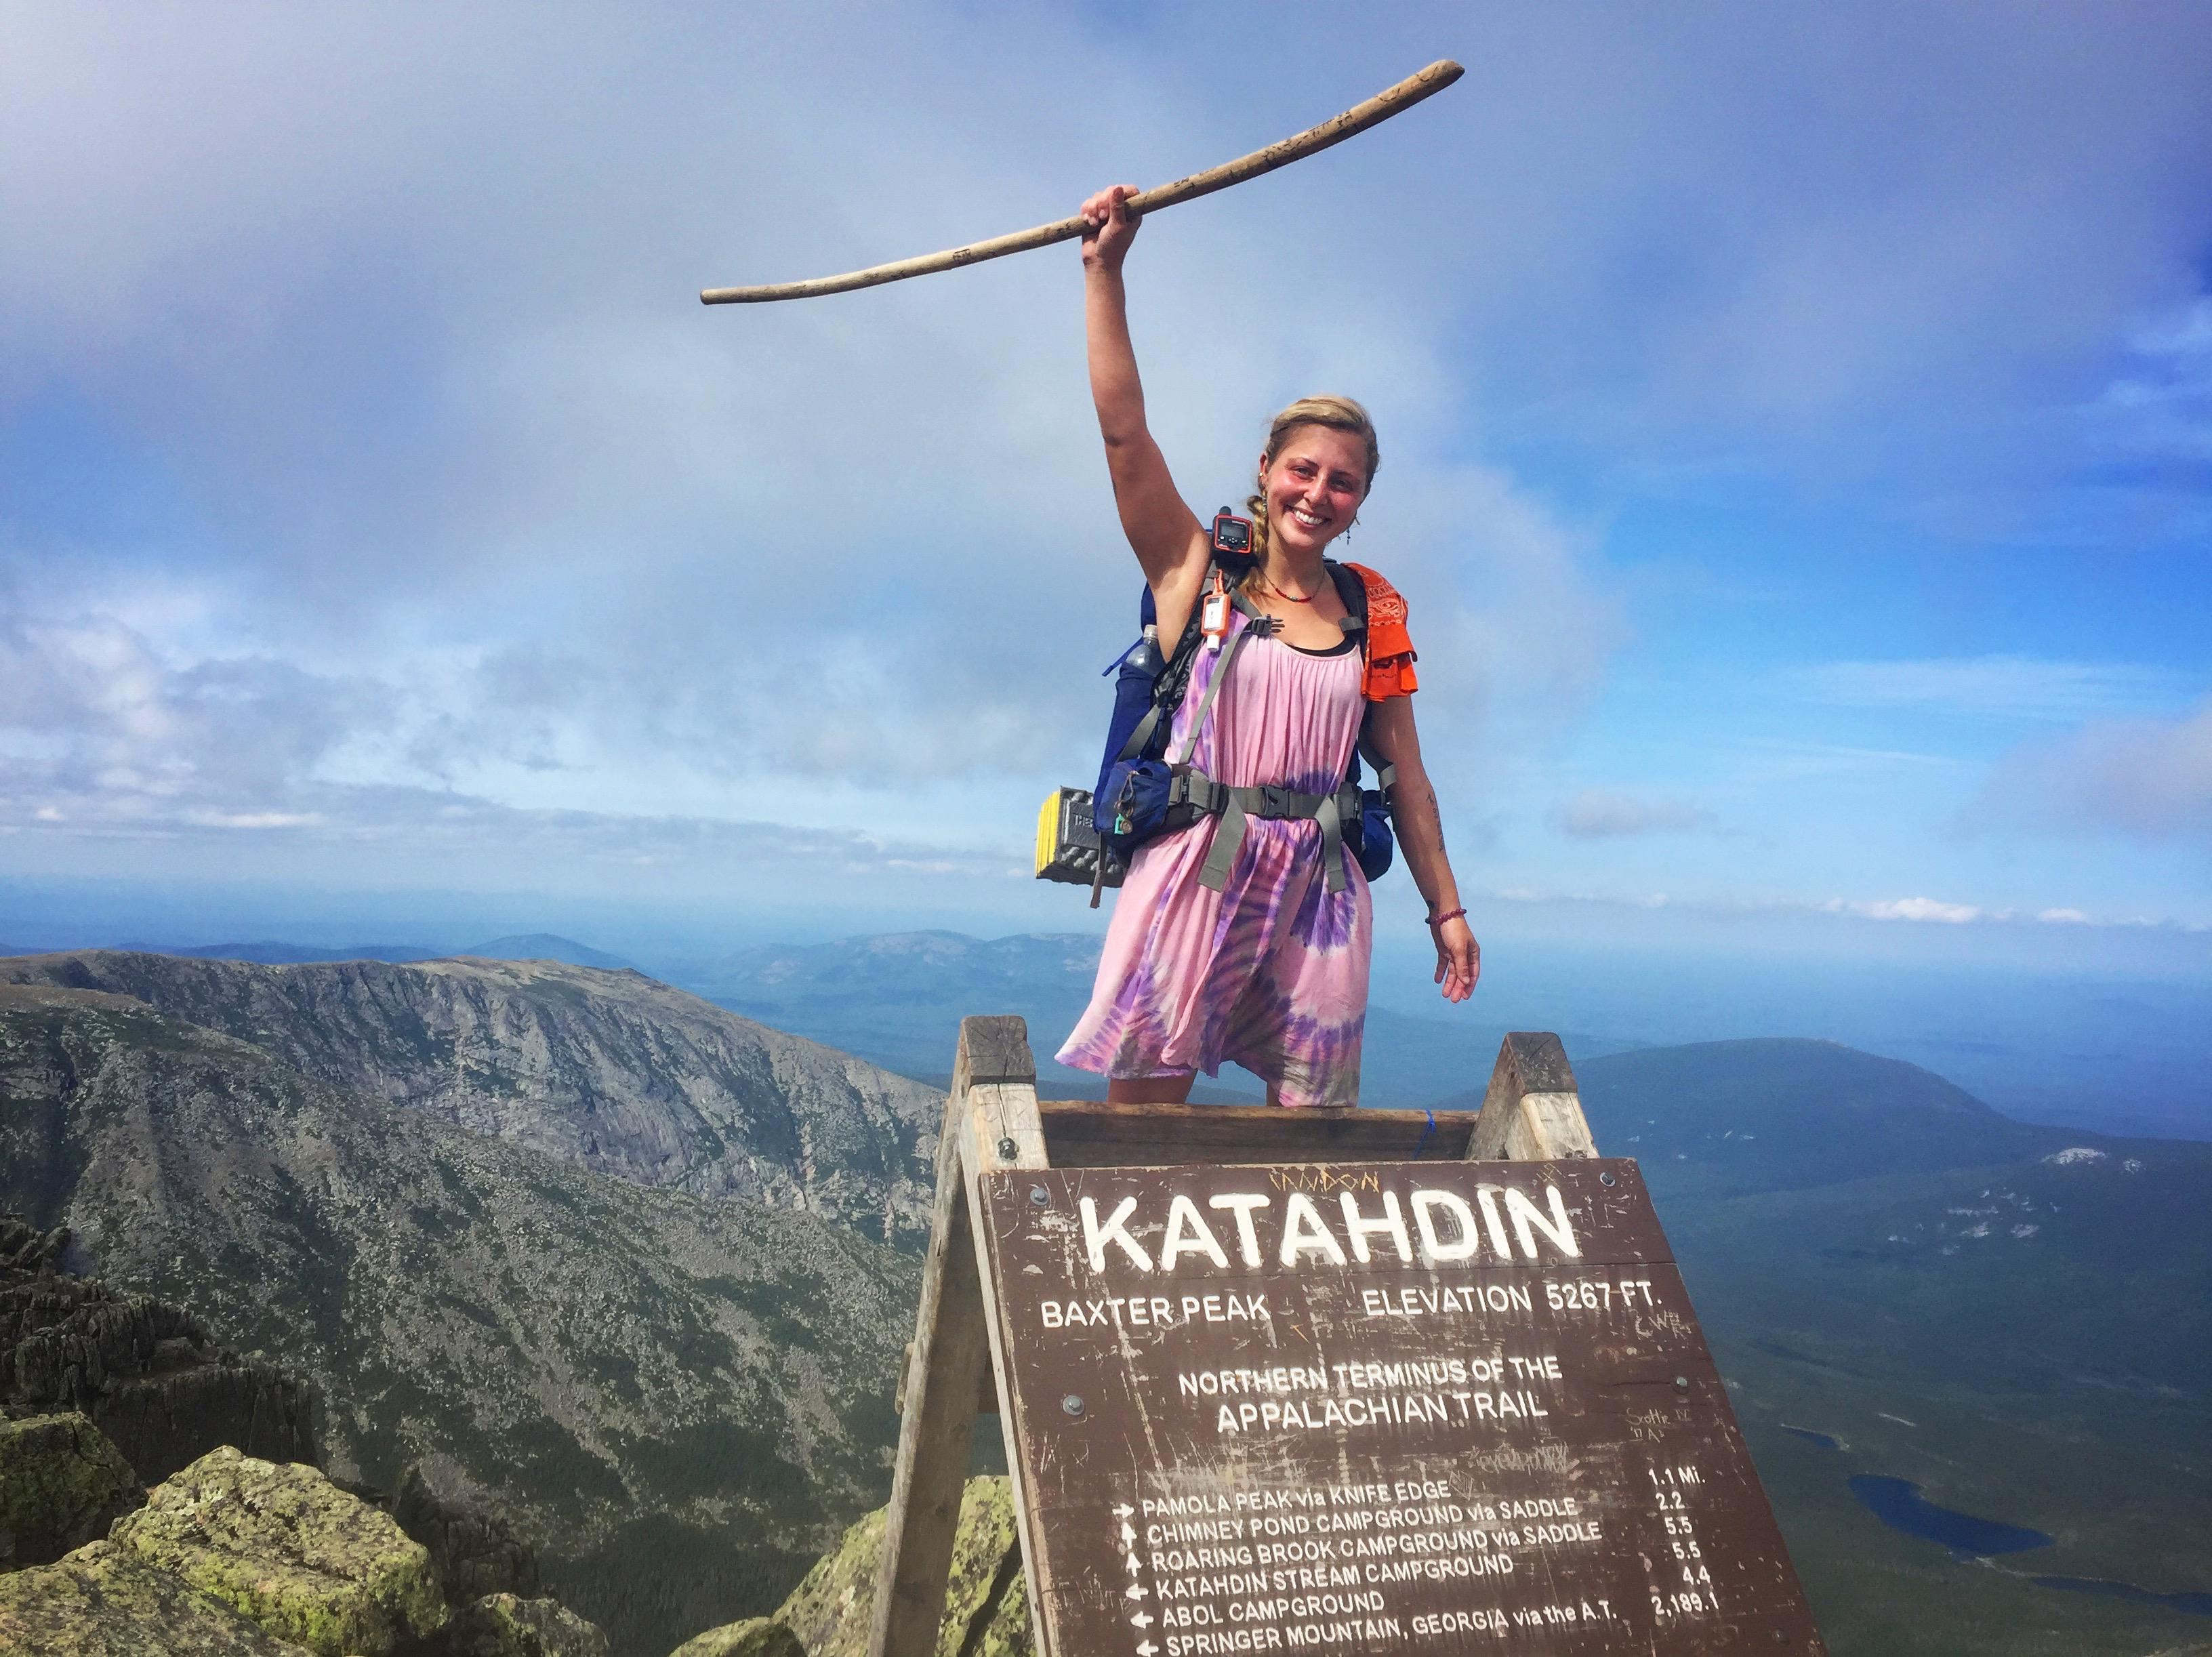 Appalachian trail thru hikers 2018 schedule